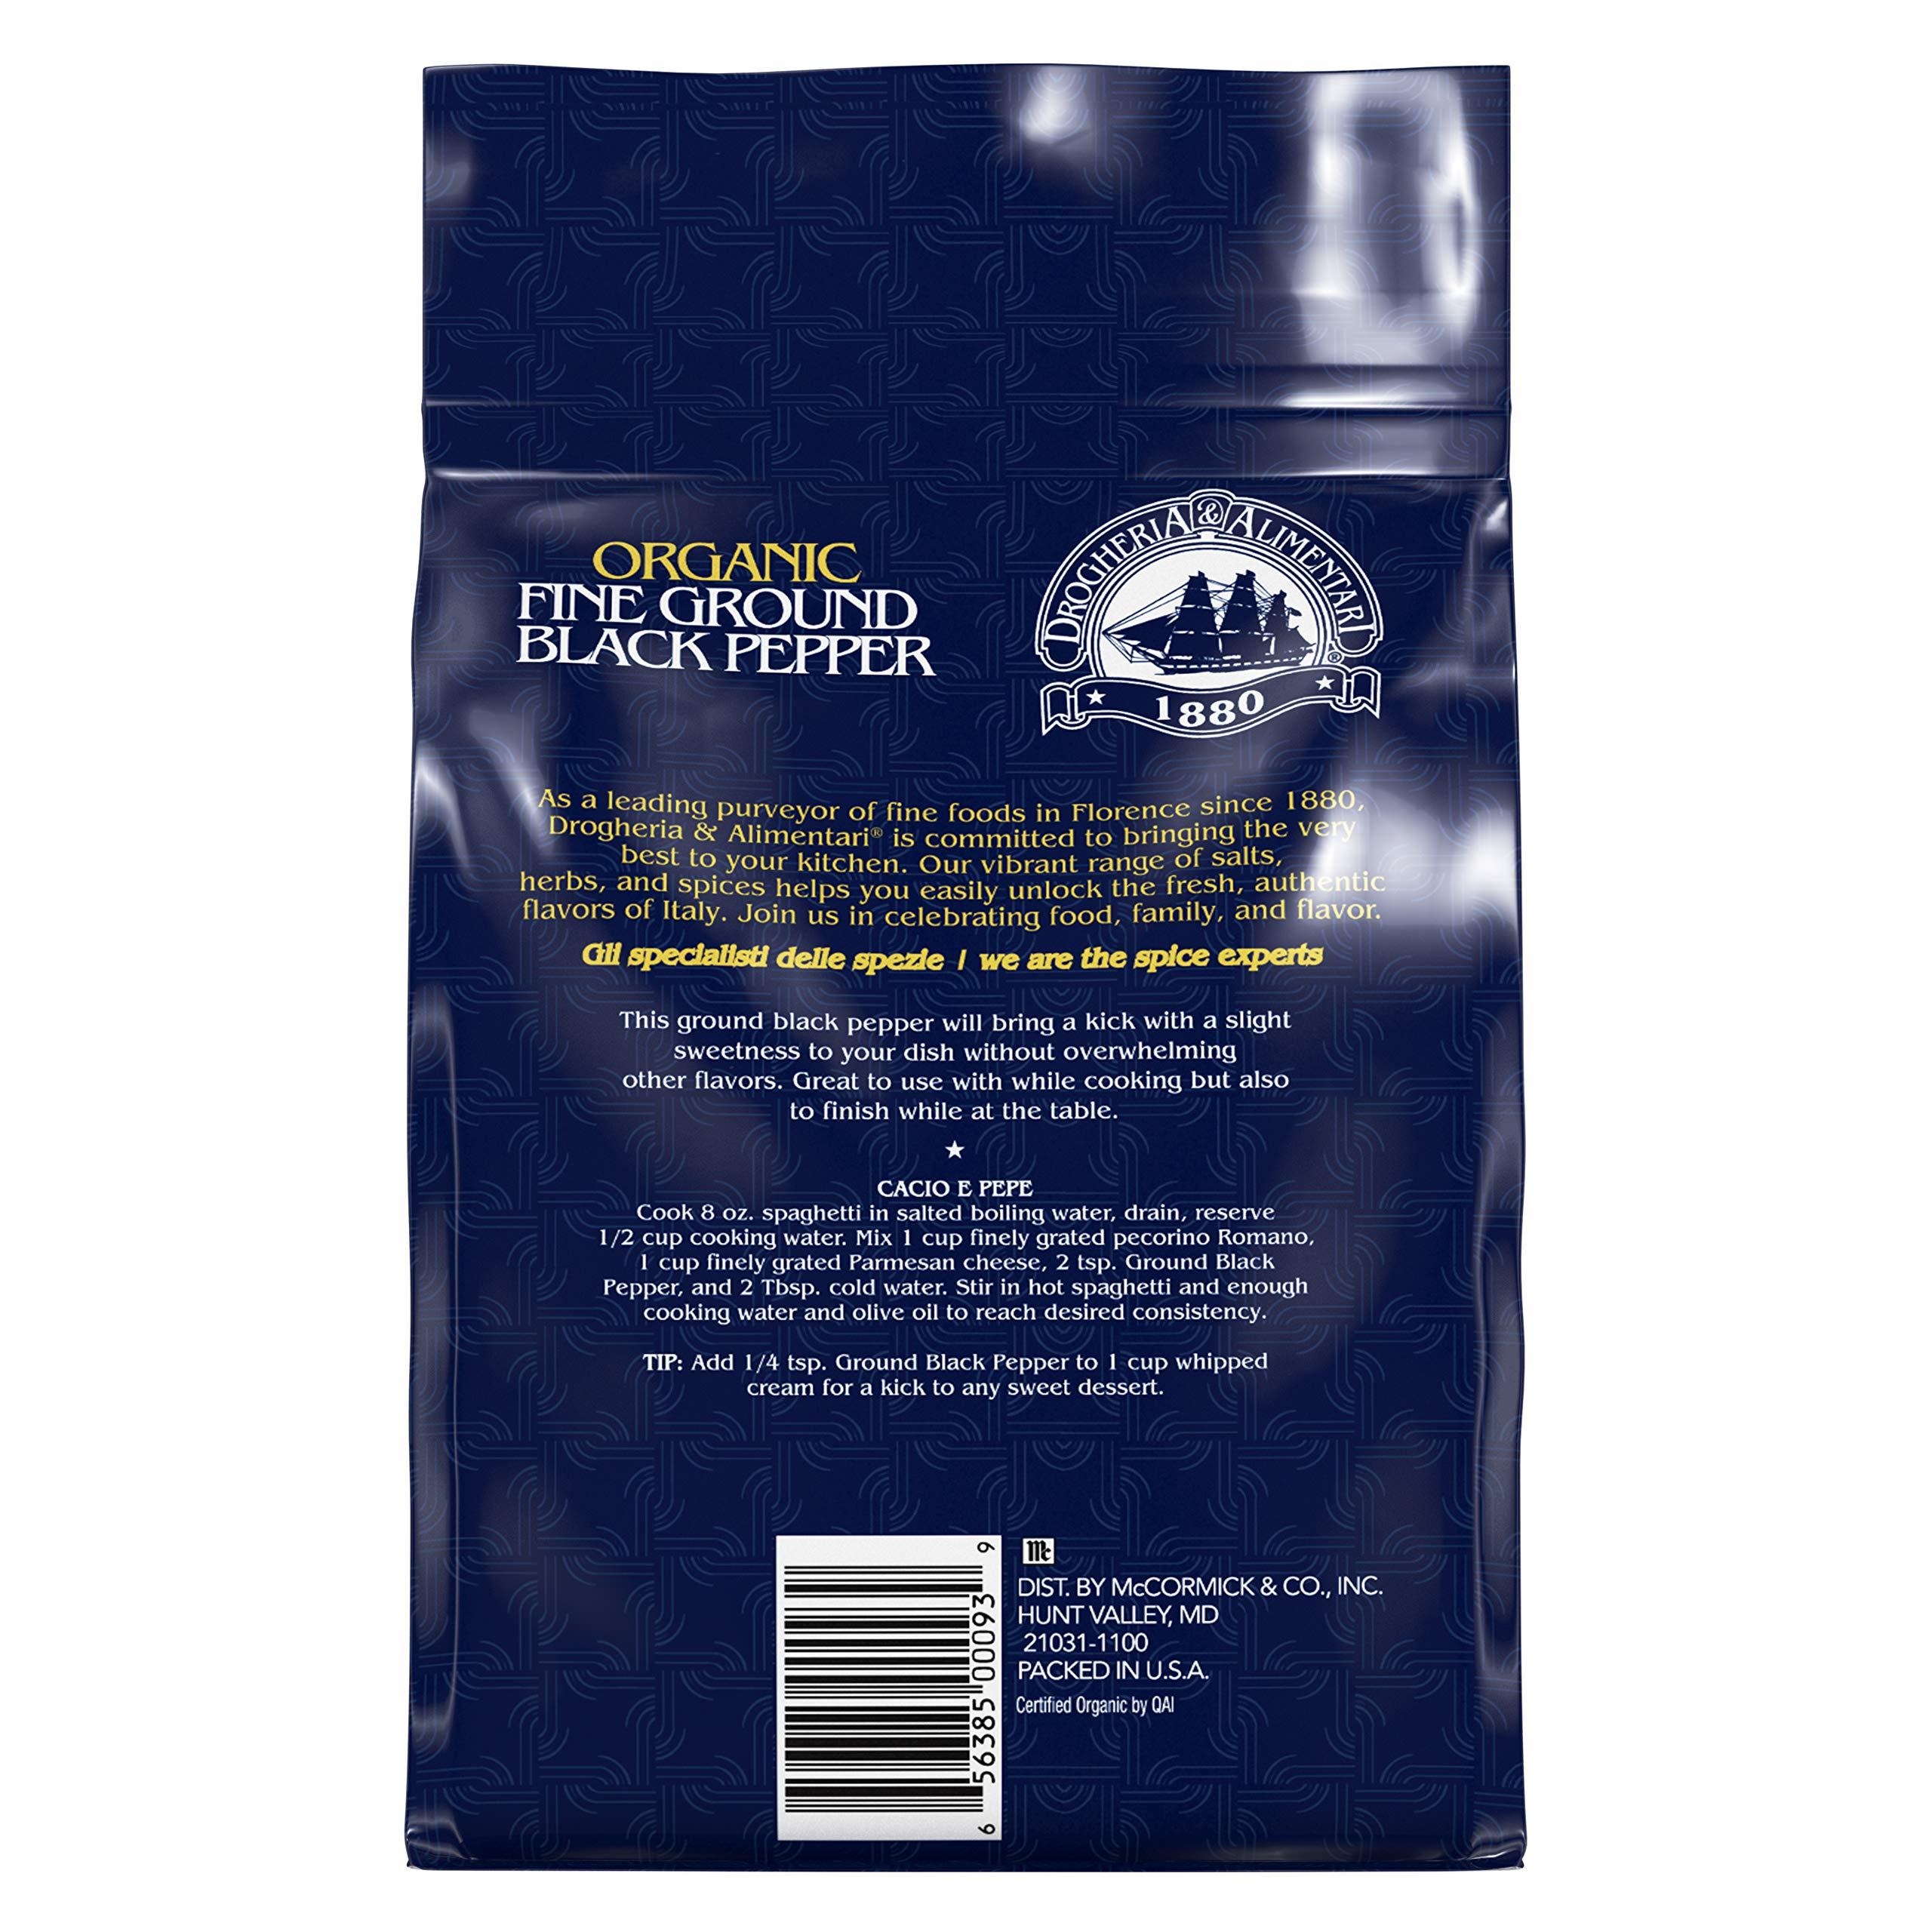 Drogheria & Alimentari Organic Fine Ground Black Pepper, 18.7 oz by Drogheria & Alimentari (Image #1)